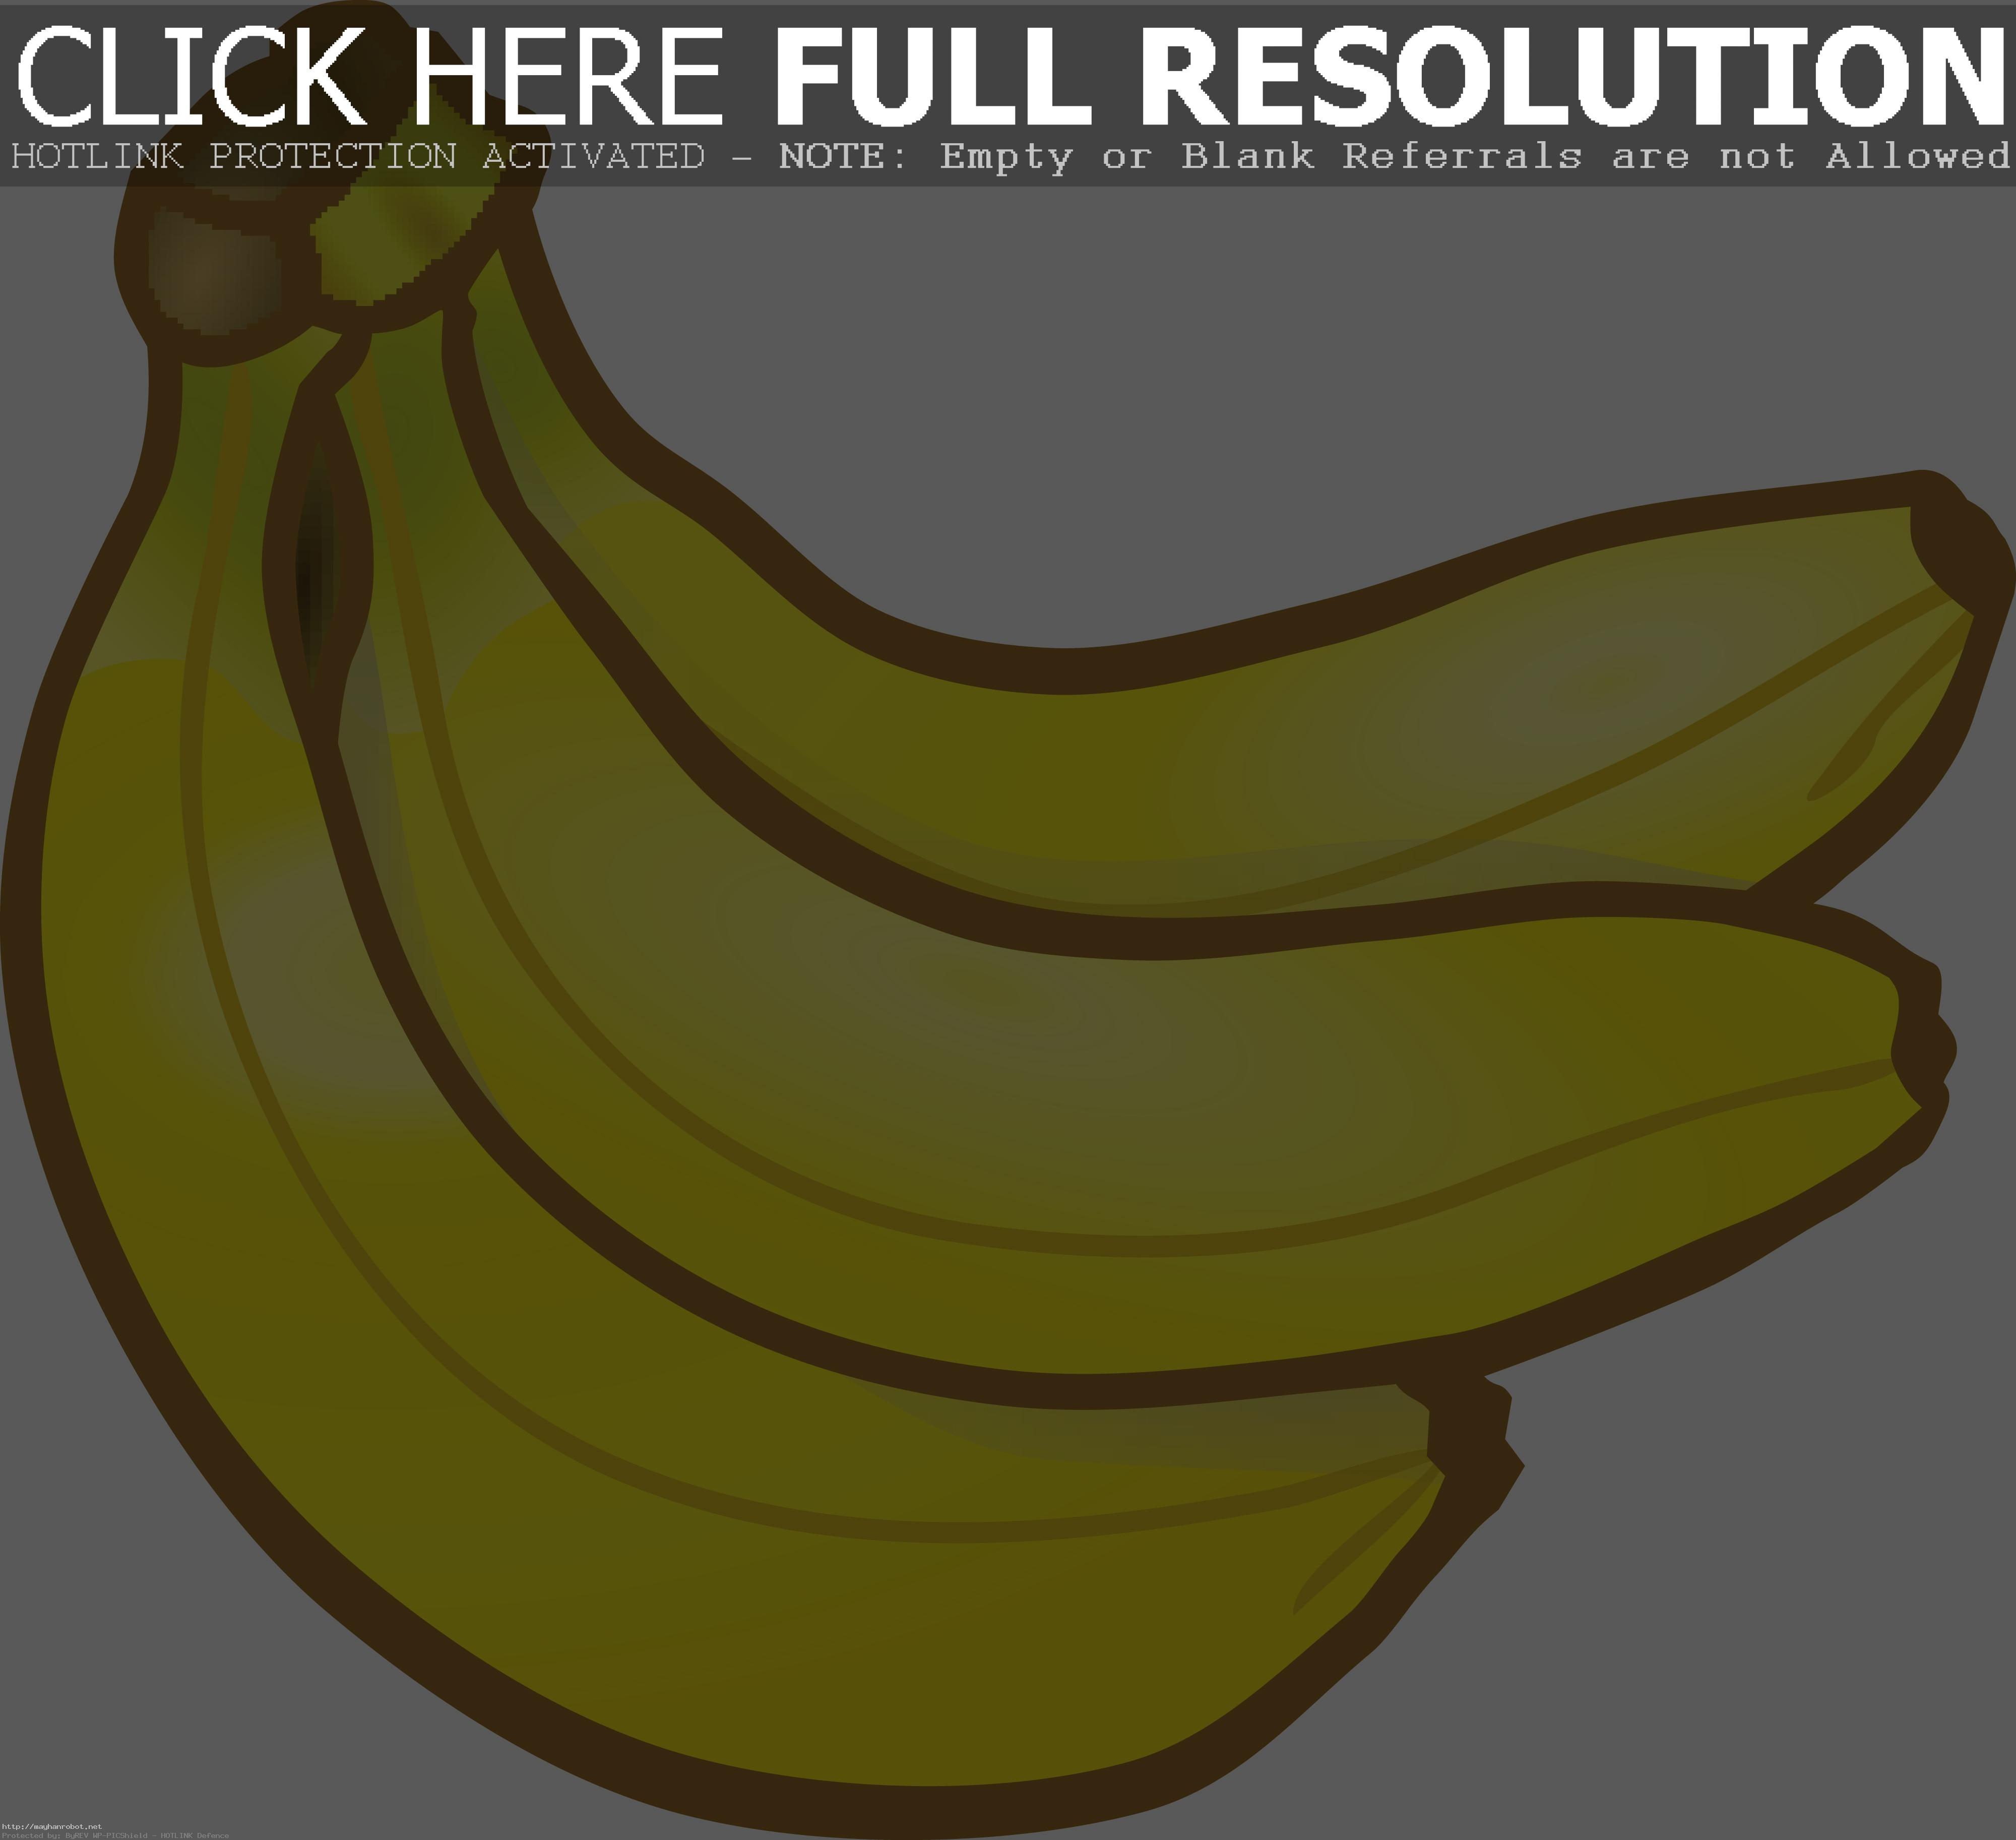 1636 Free Clipart Of A Banana Clip Art